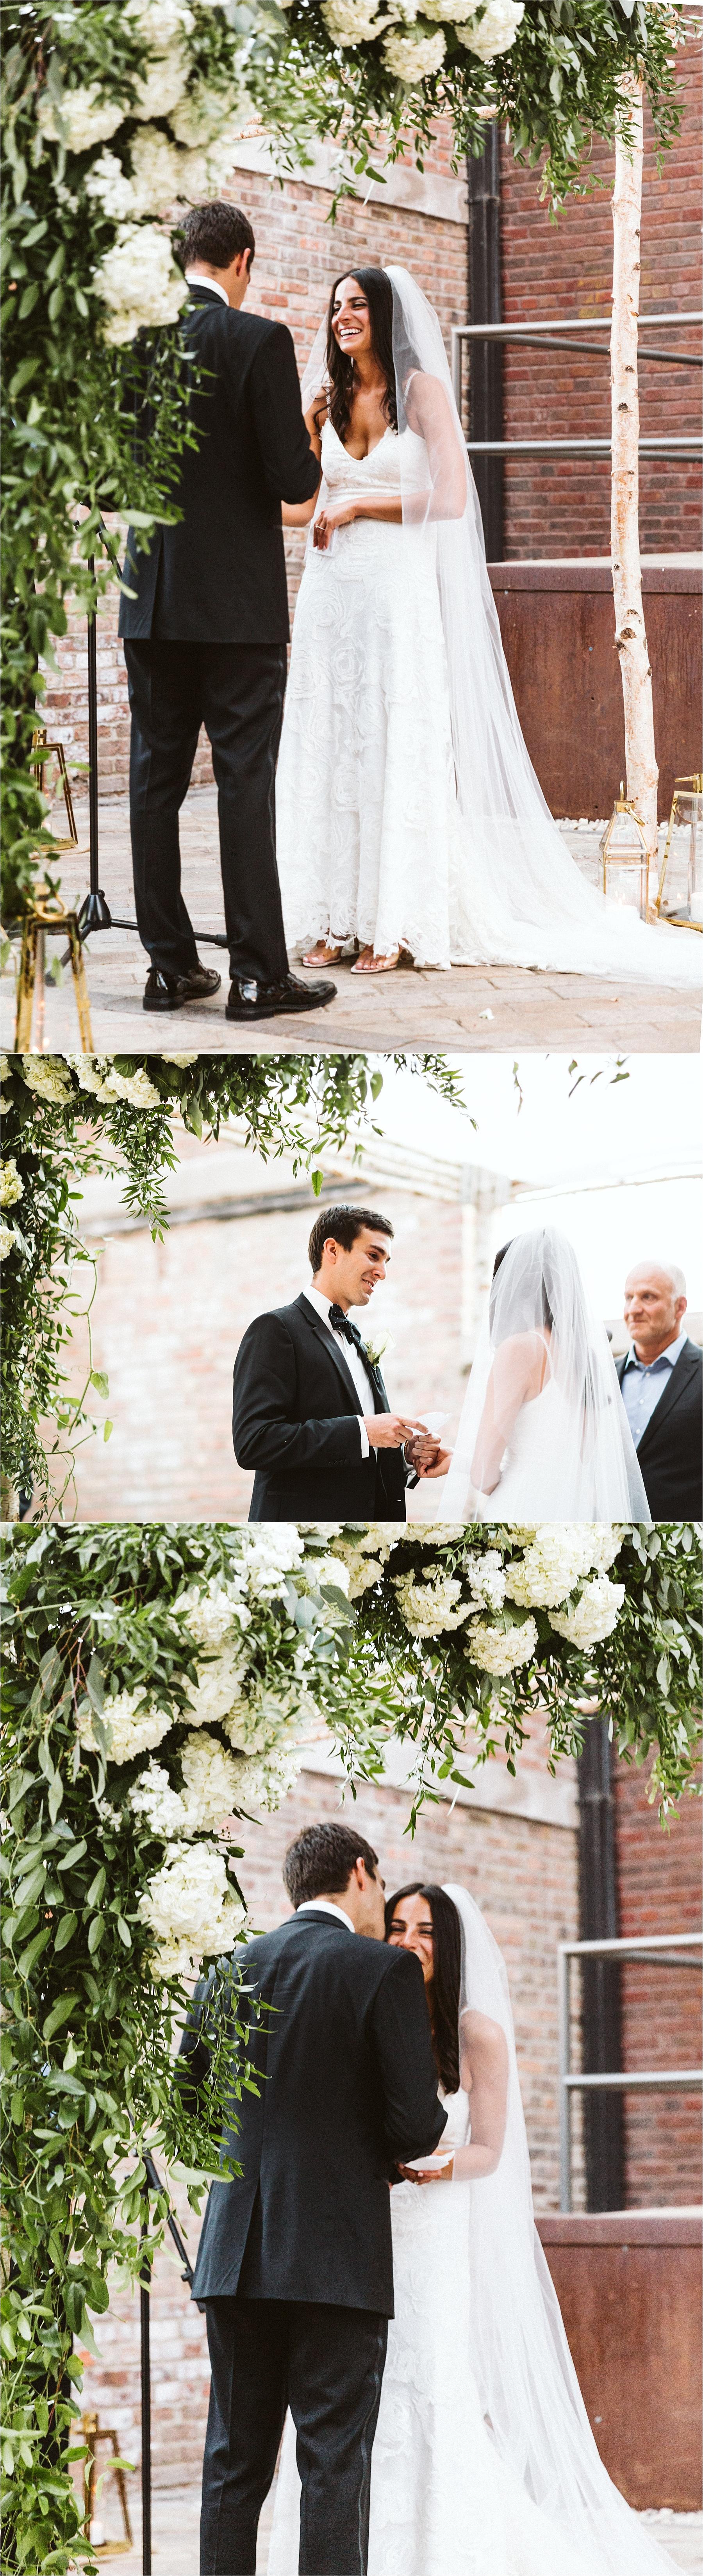 Bridgeport Art Center Wedding_0090.jpg